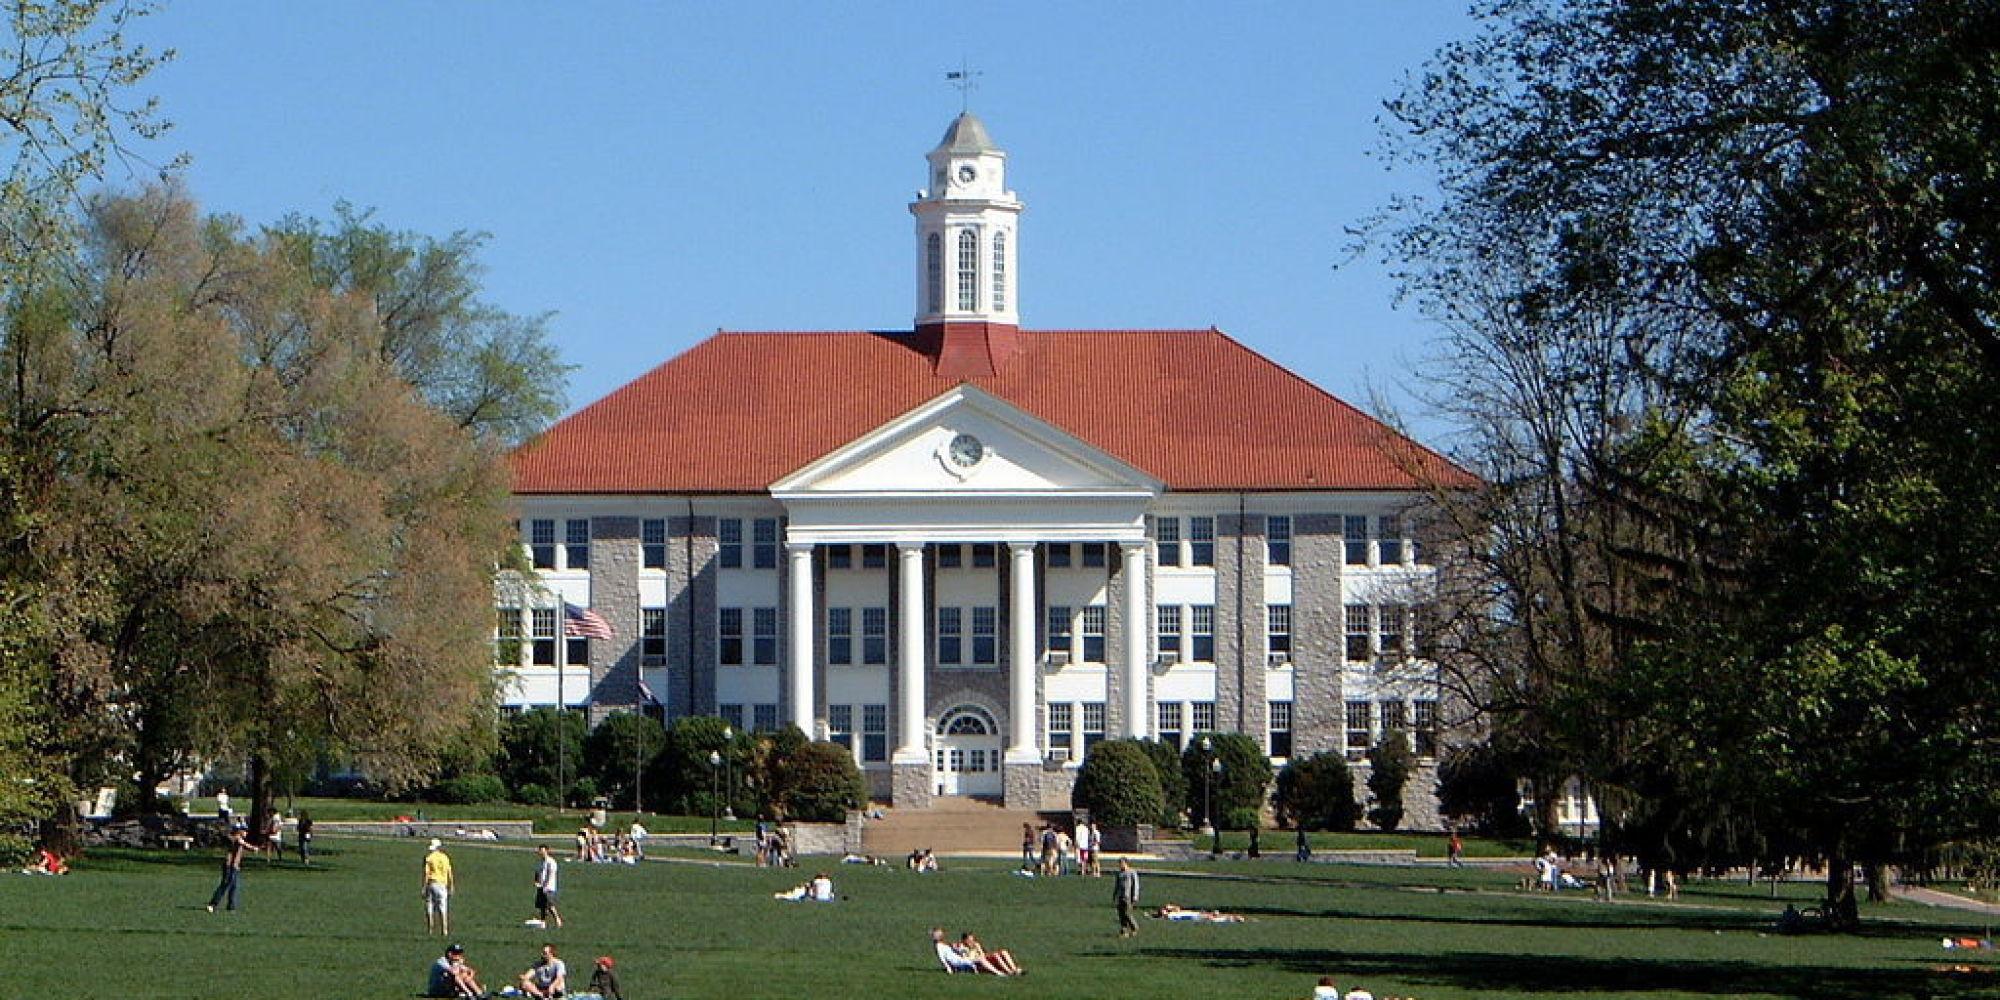 Trường đại học James Madison (James Madison University)